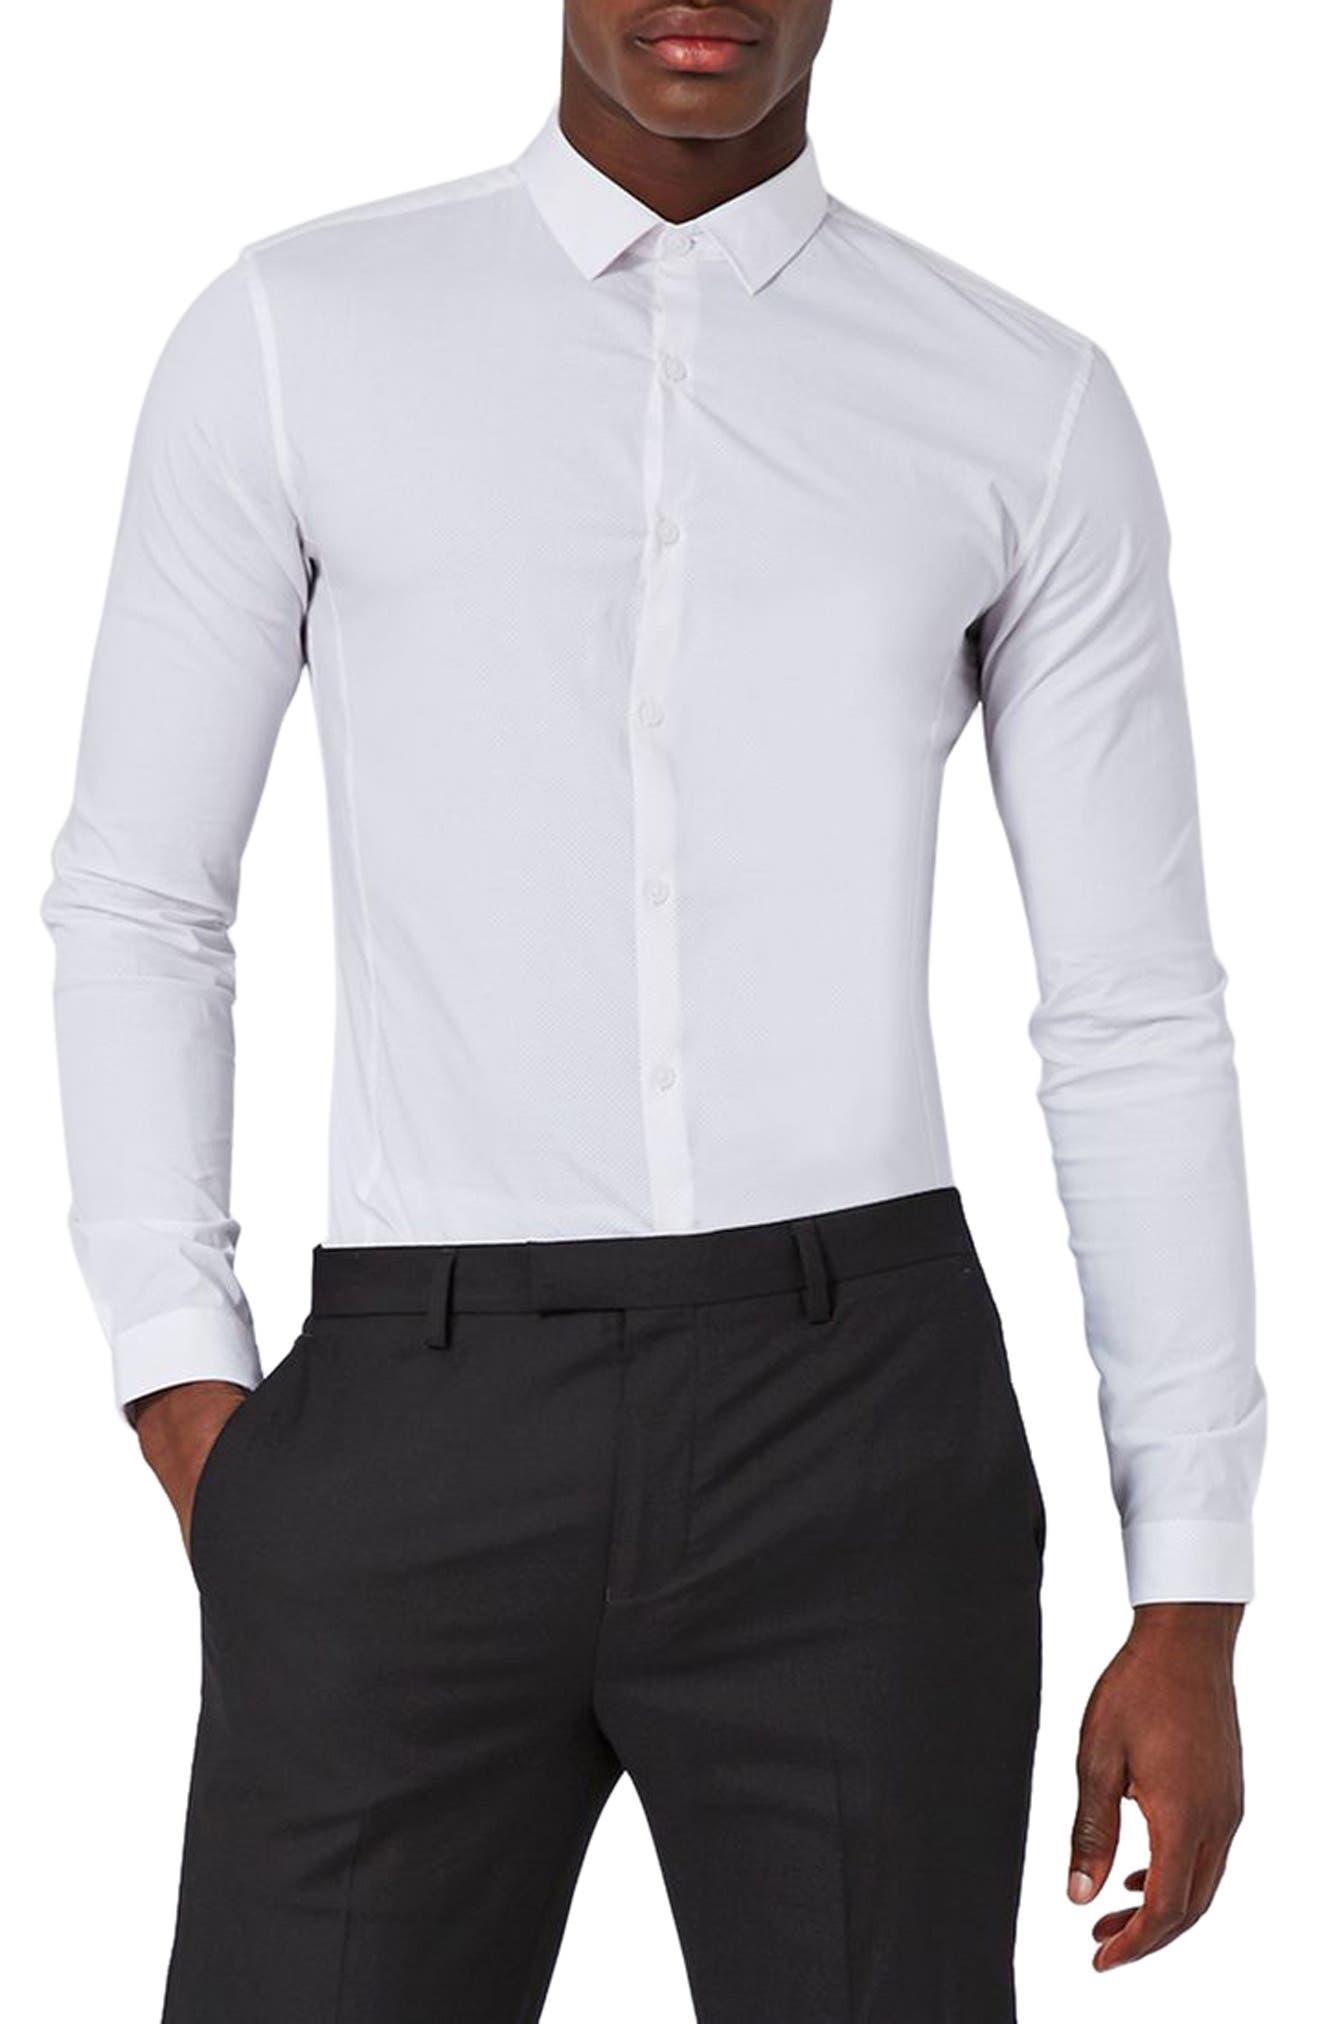 Topman Muscle Fit Polka Dot Shirt